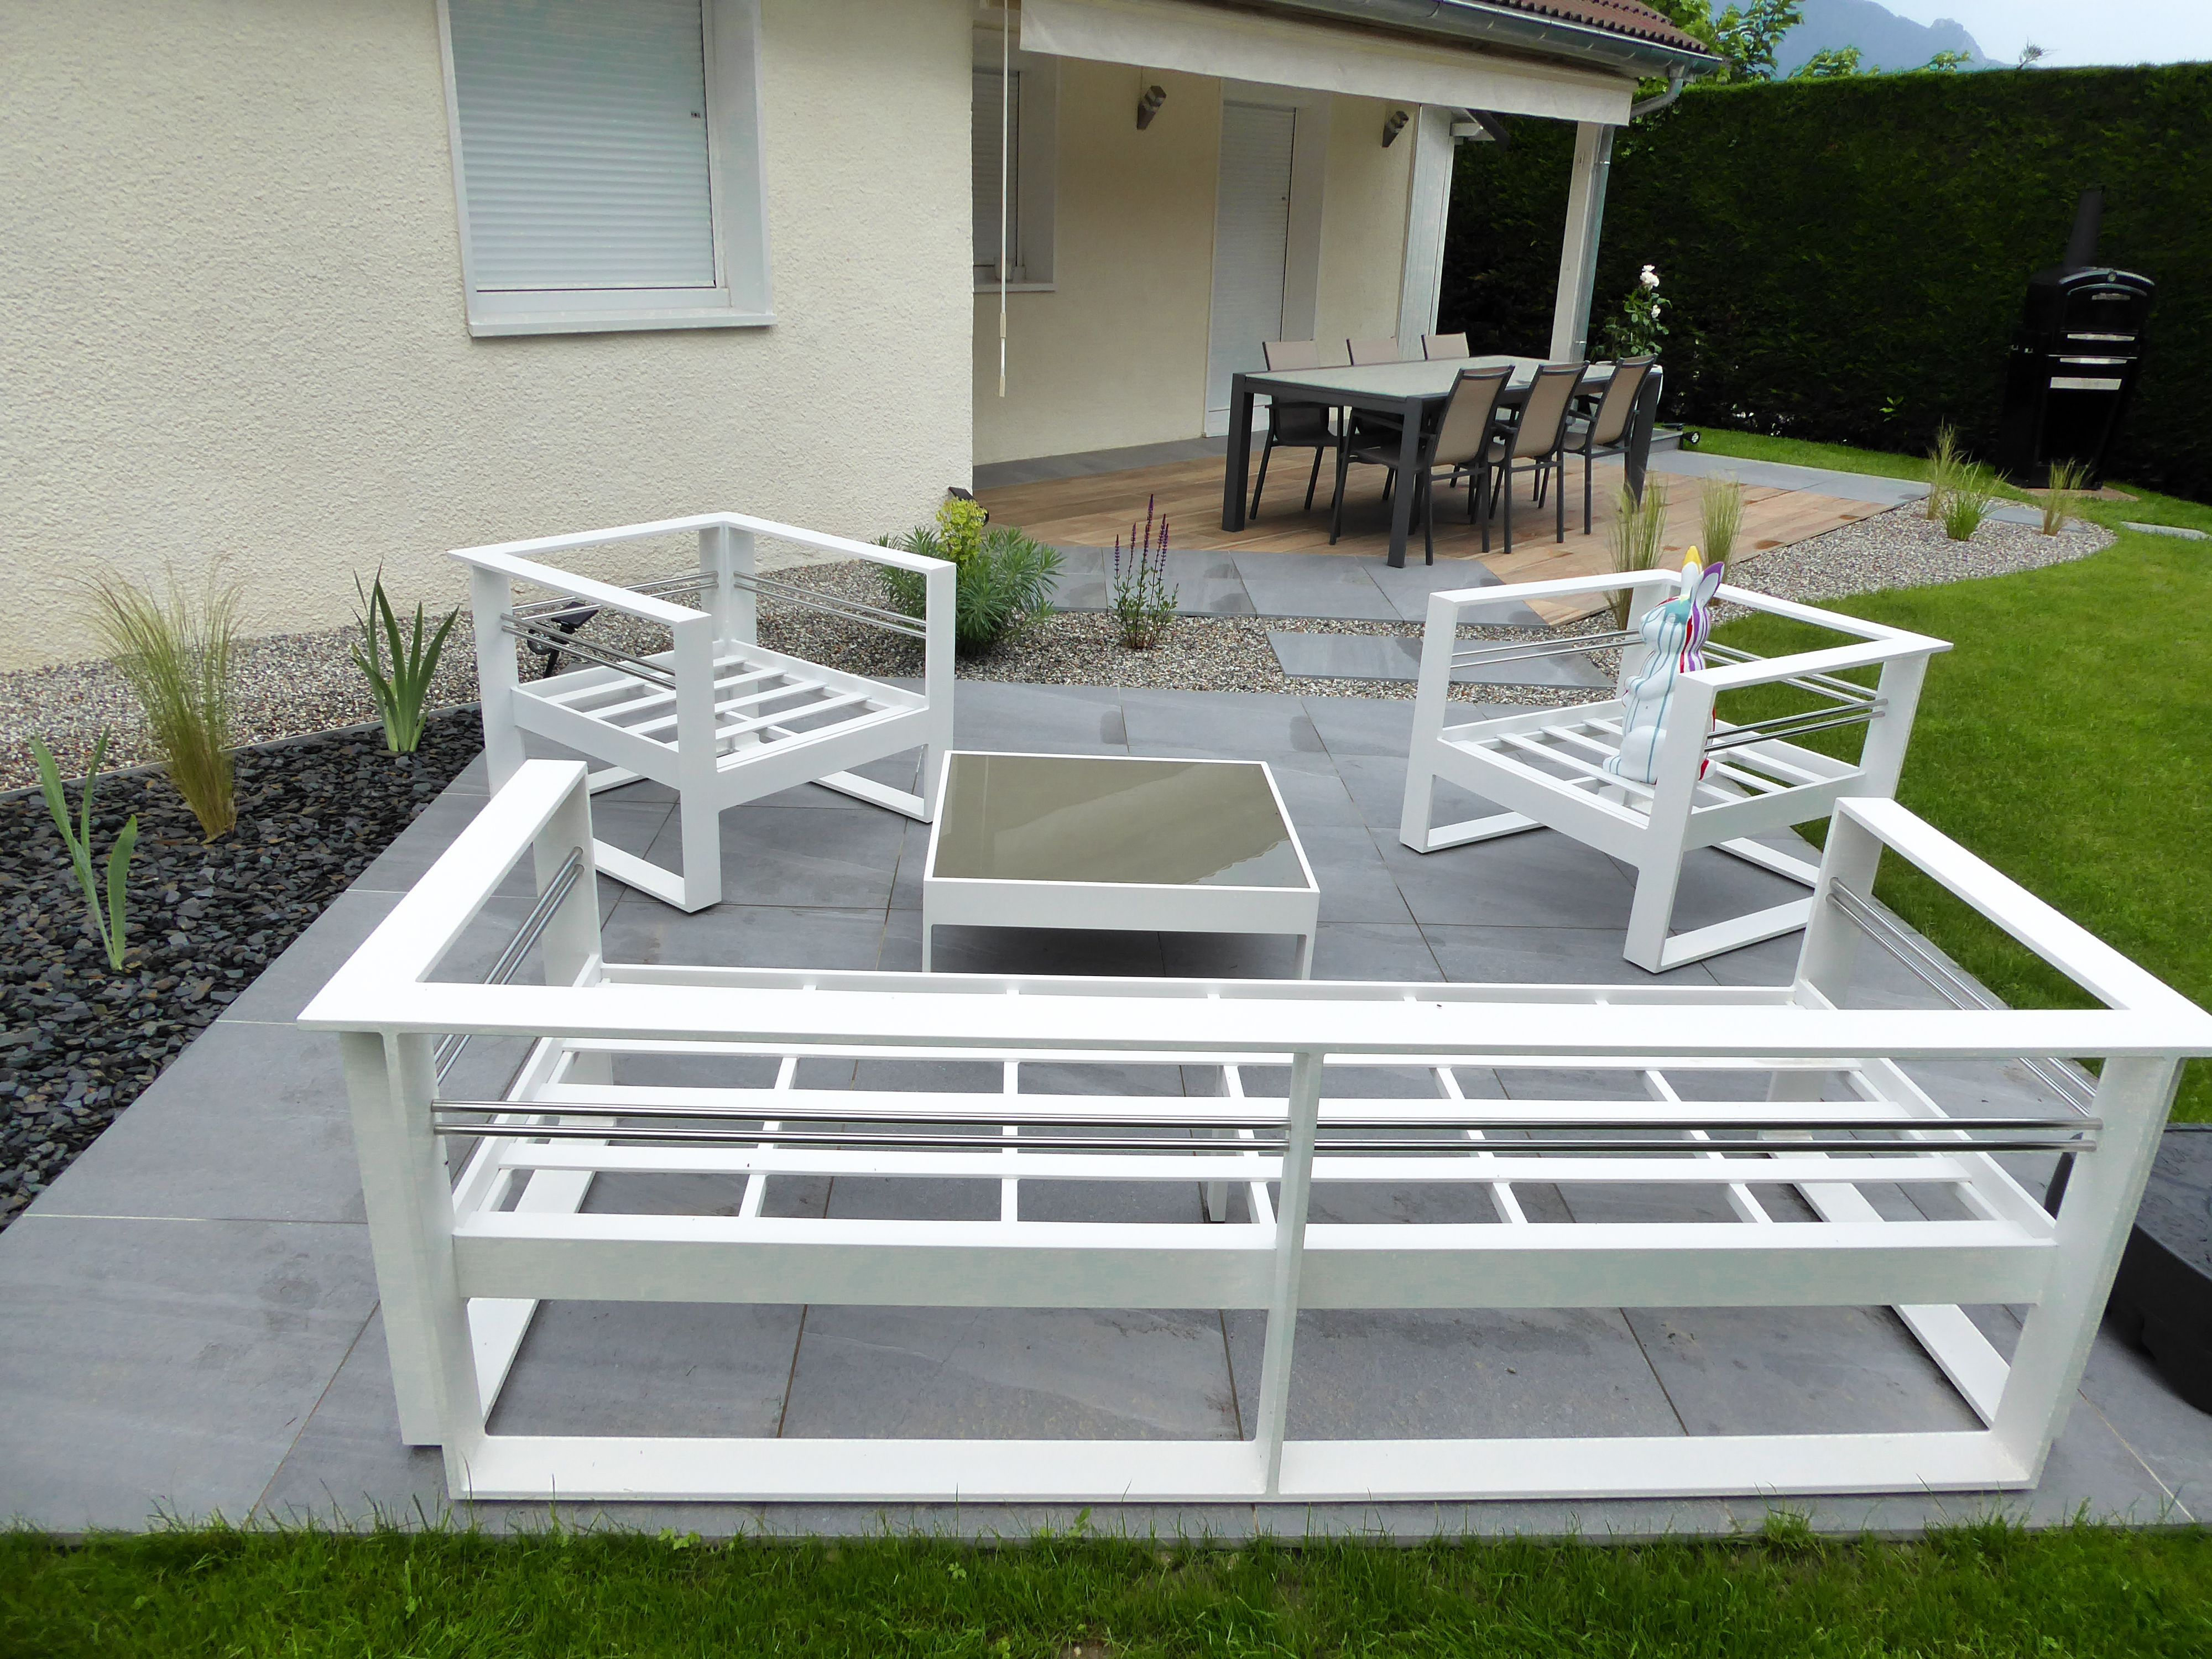 100 Incroyable Idées Salon De Jardin Petit Espace